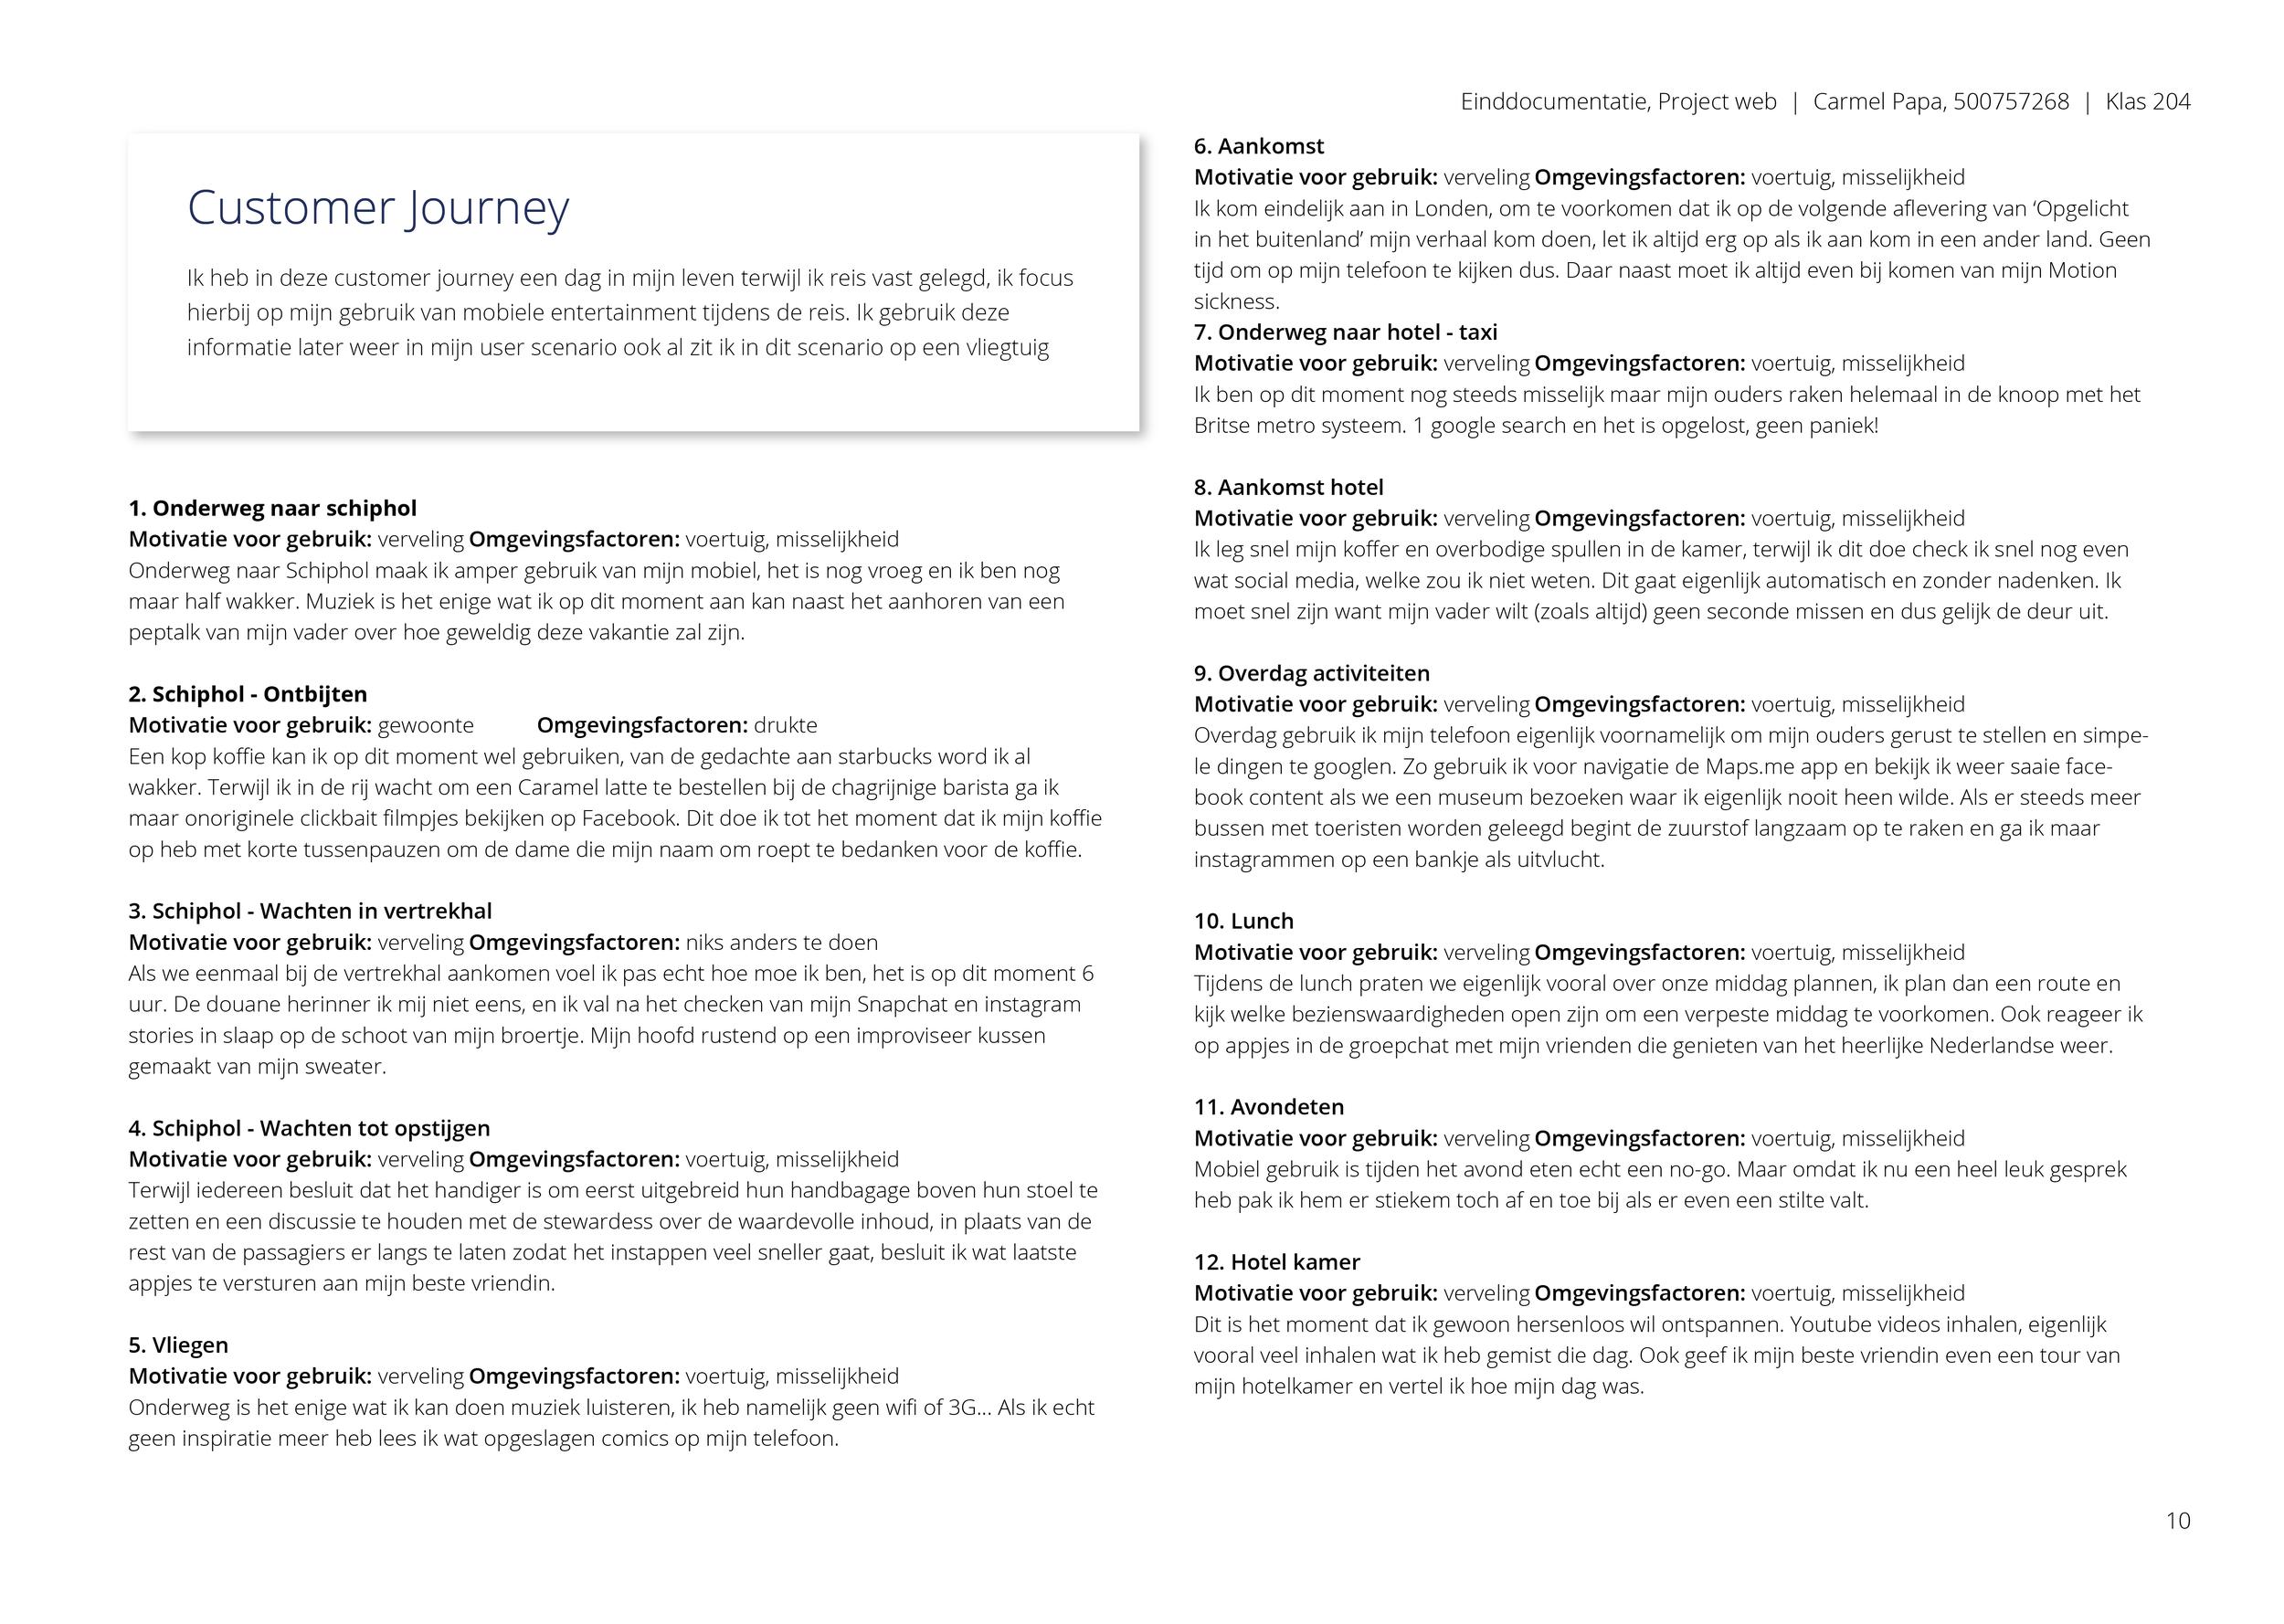 Einddocument_Project Web_Carmel Papa_204_Customer journey.png